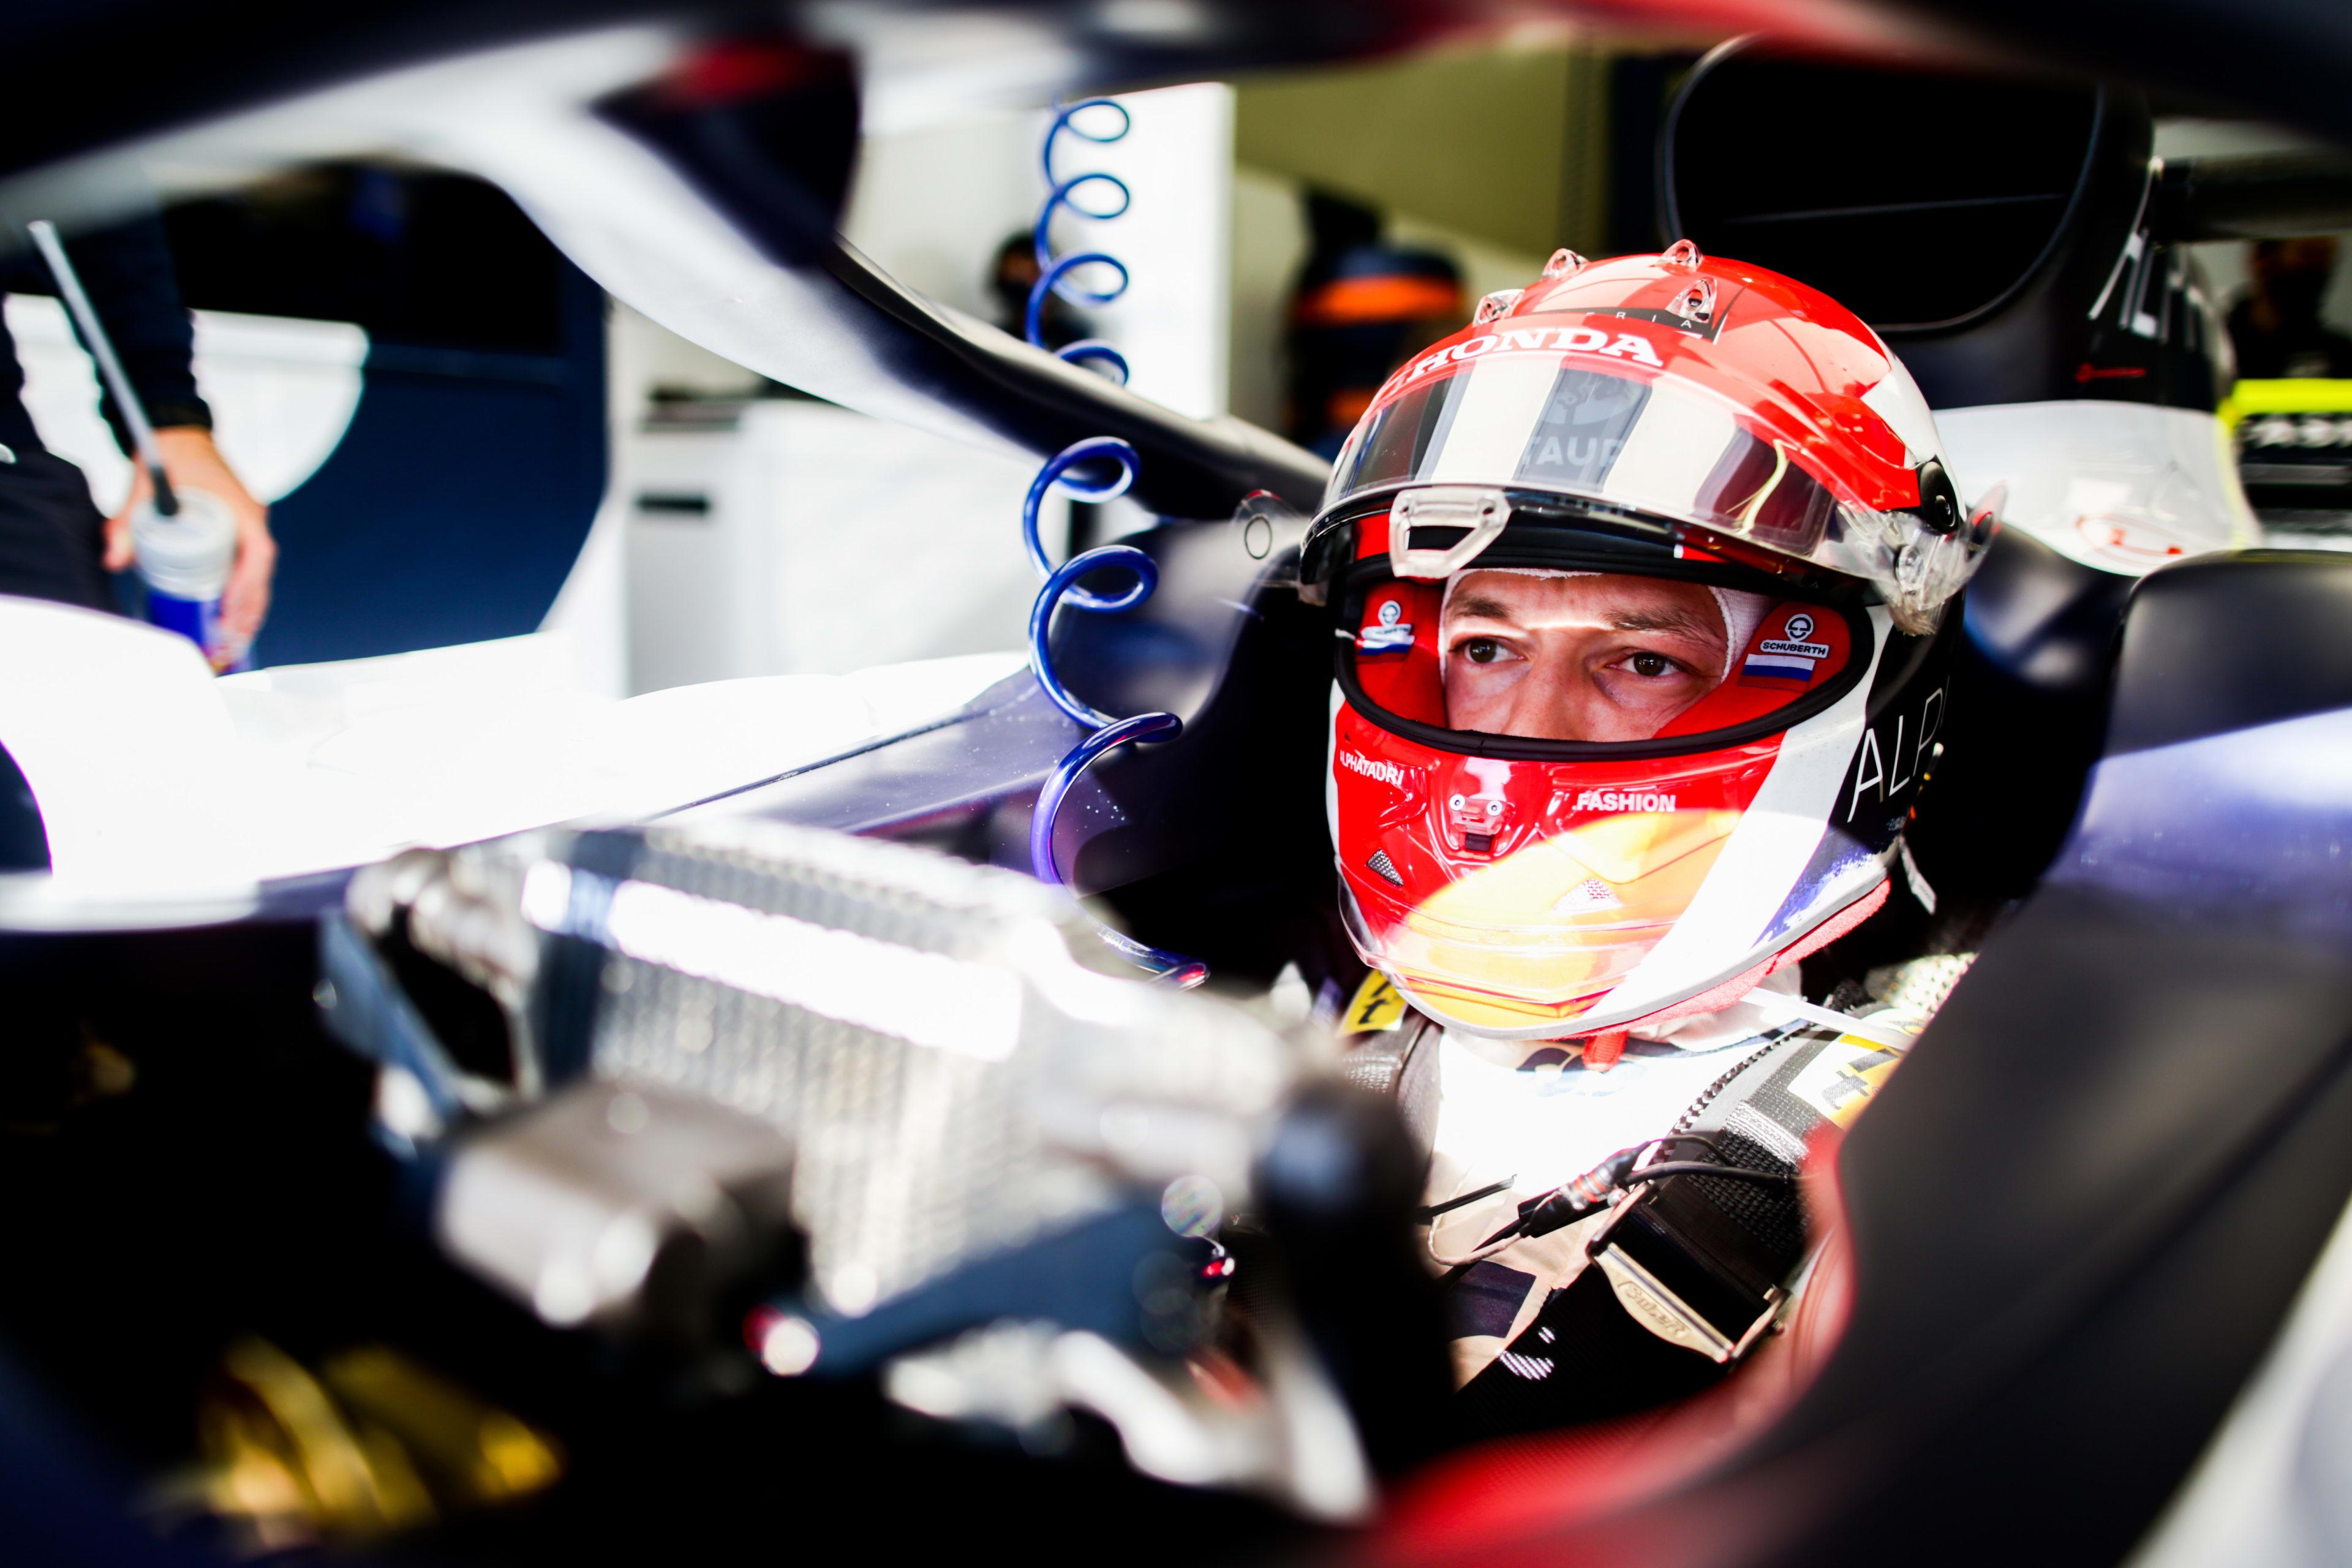 Daniil Kvyat admits his chances of staying at AlphaTauri in 2021 are 'very slim' | Formula 1®